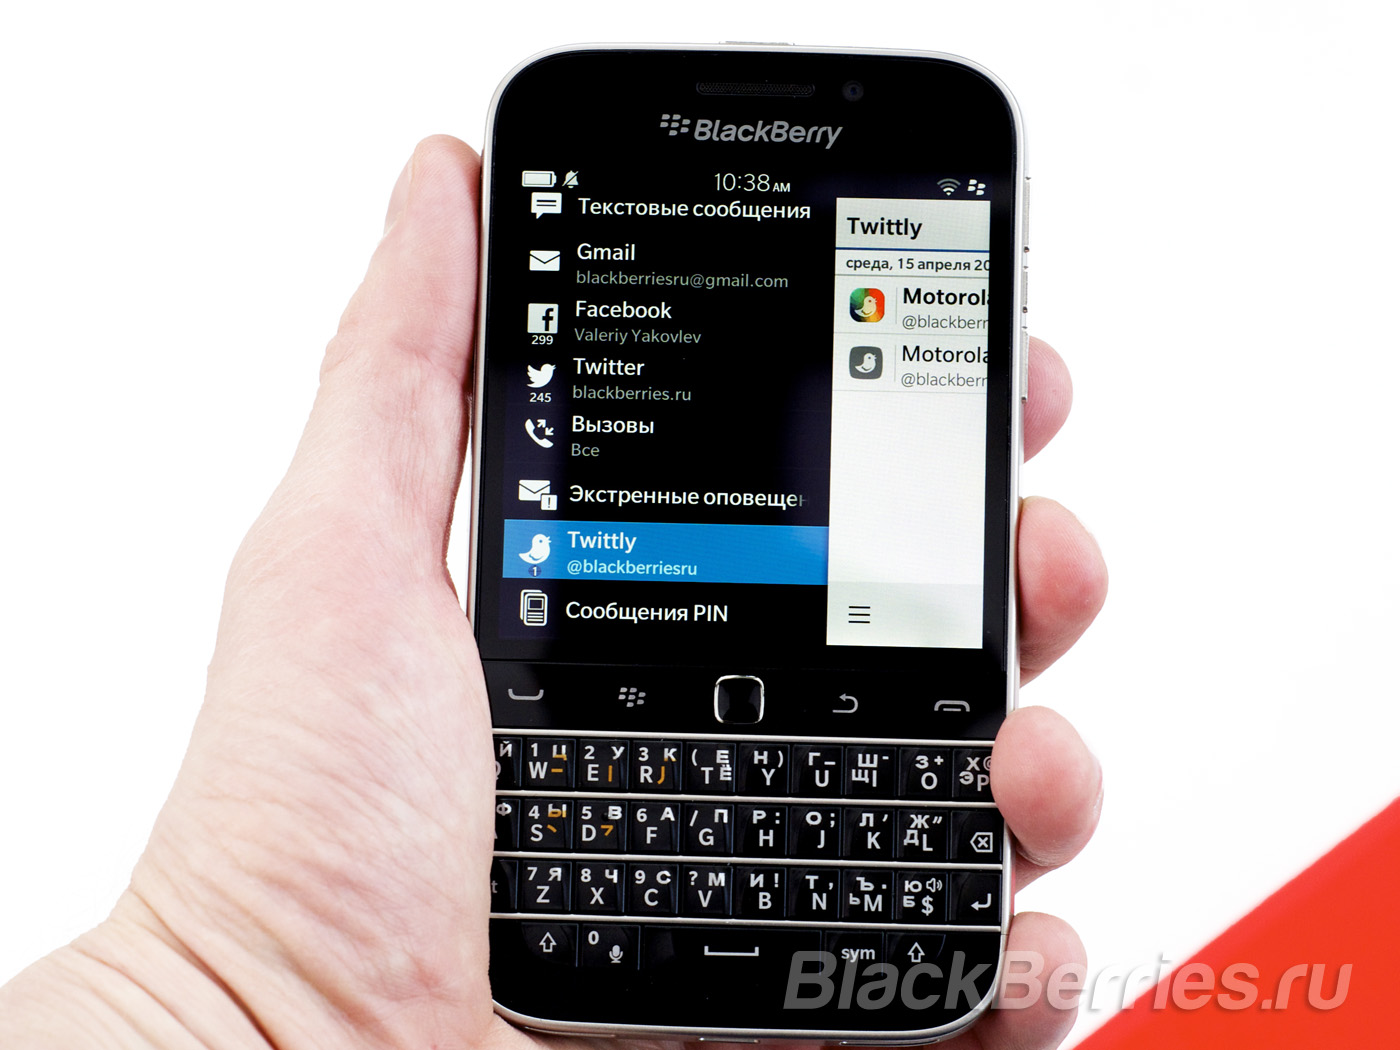 BlackBerry-Classic-Twittly-1